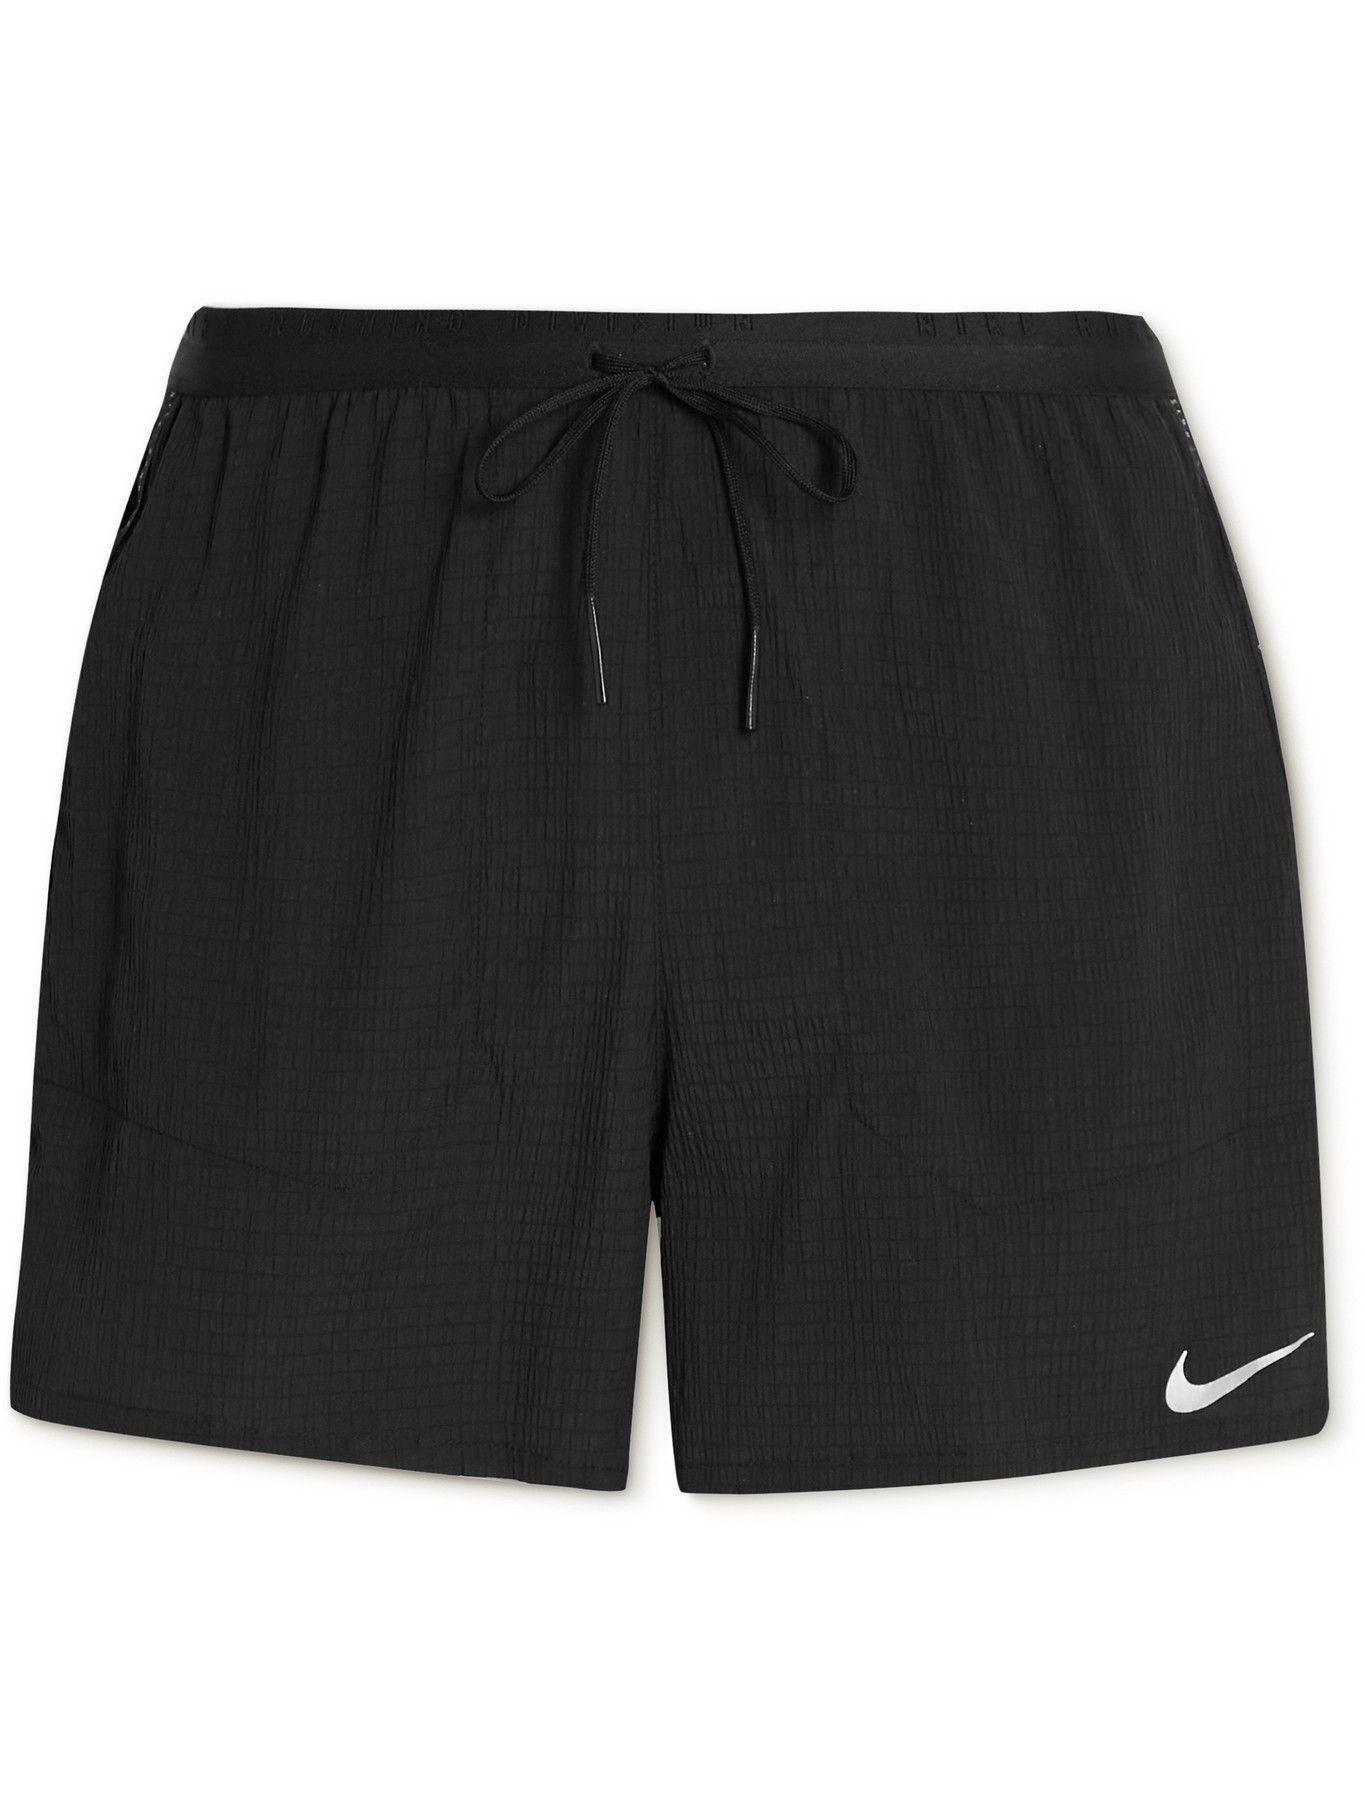 NIKE RUNNING - Flex Stride Run Division Crinkled Stretch-Nylon and Shell Shorts - Black